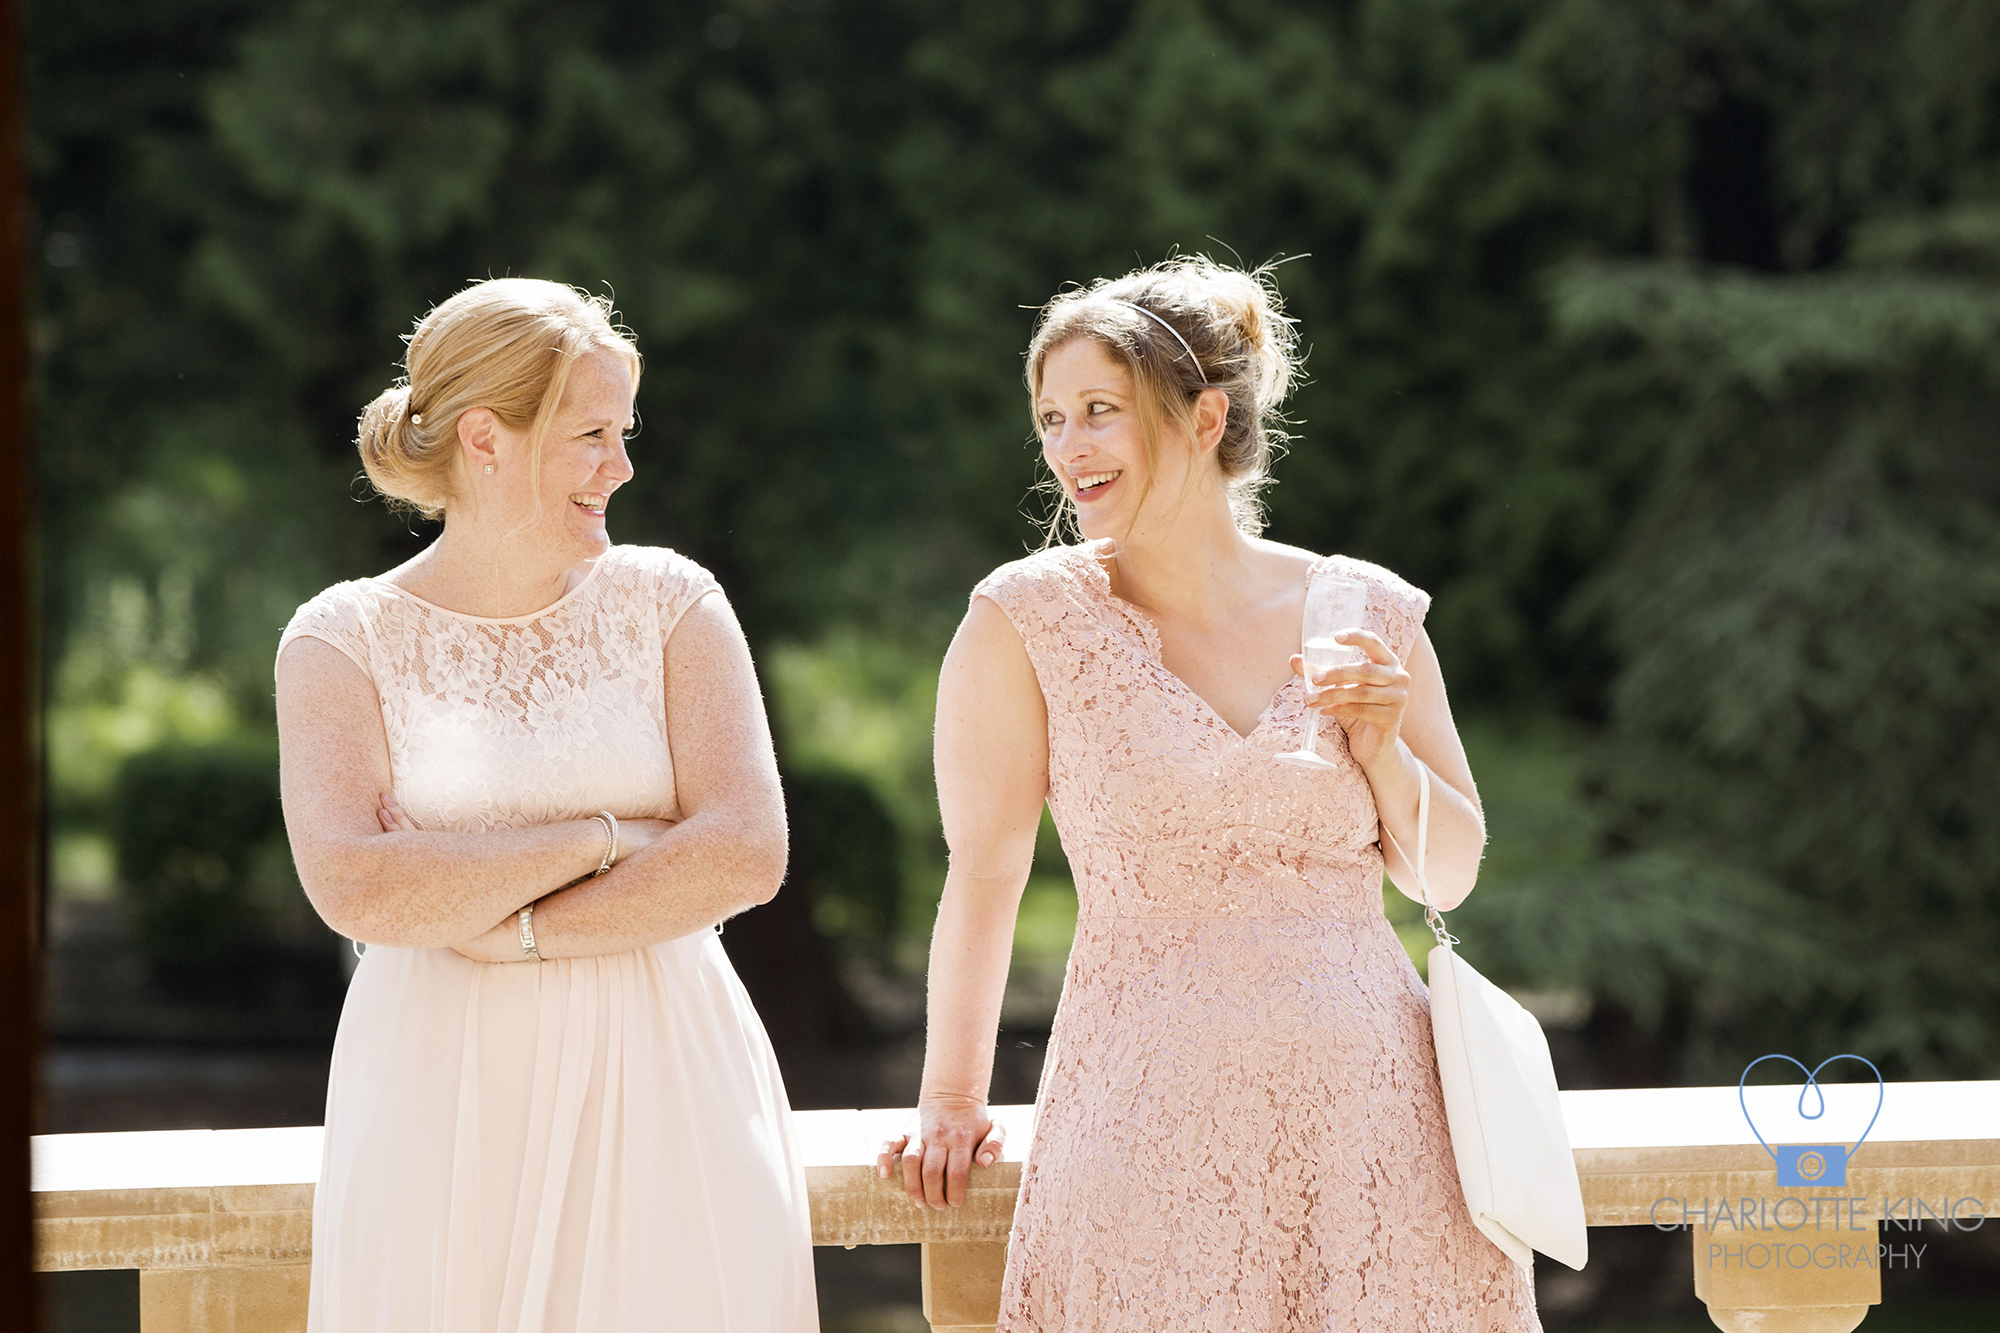 Woldingham-school-wedding-charlotte-king-photography (118)